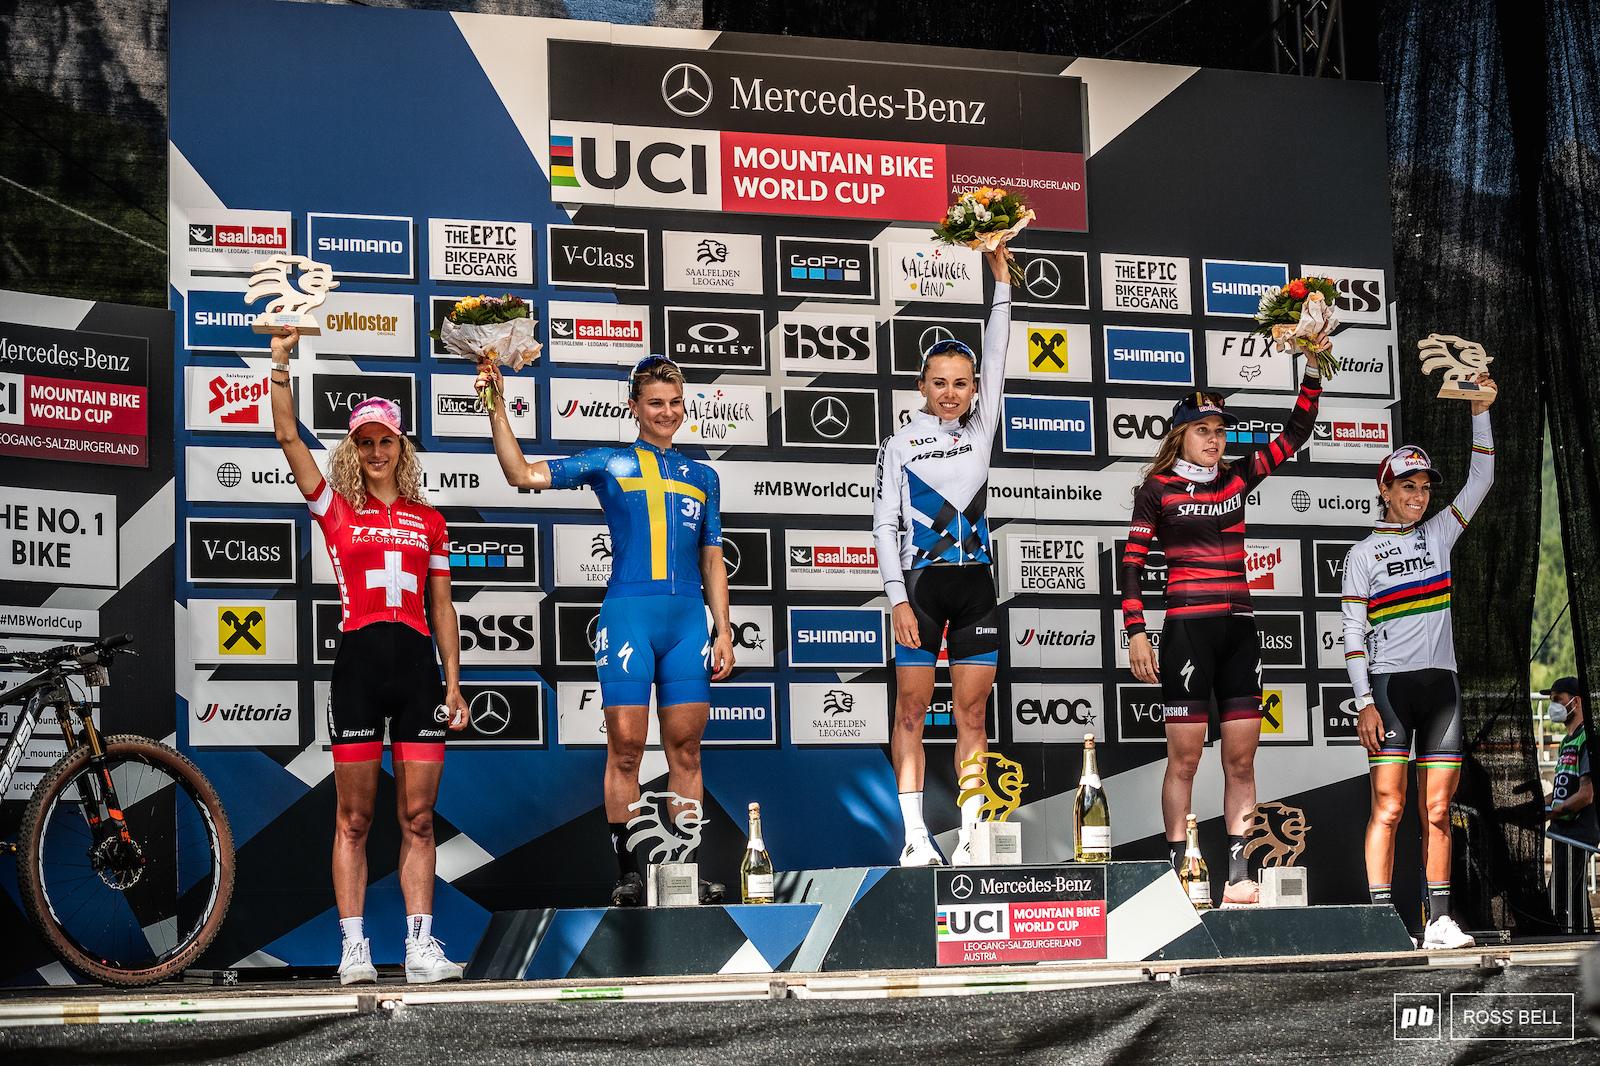 Your top 5 elite women 1st Loana Lecomte 2nd Jenny Rissveds 3rd Laura Stigger 4th Jolanda Neff 5th Pauline Ferrand Prevot